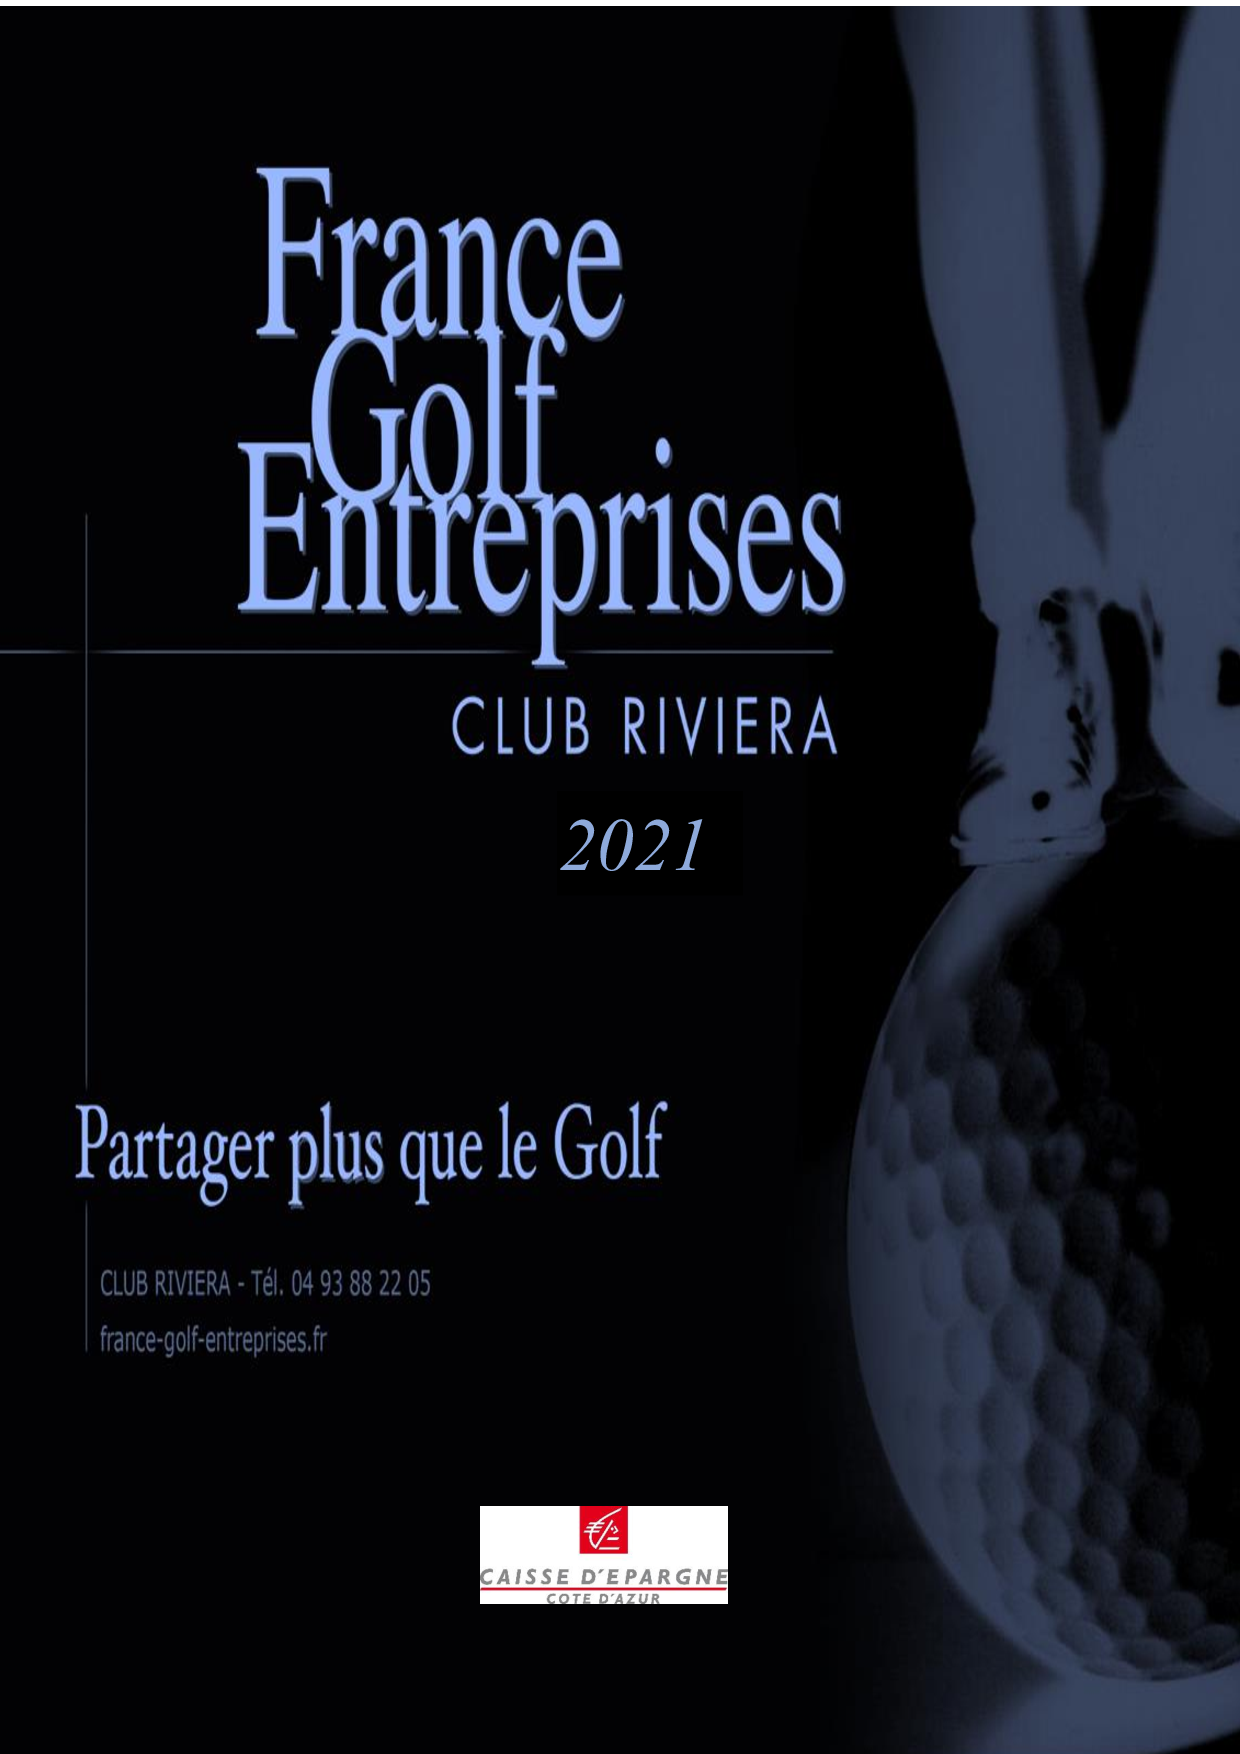 France Golf Entreprises (FGE)